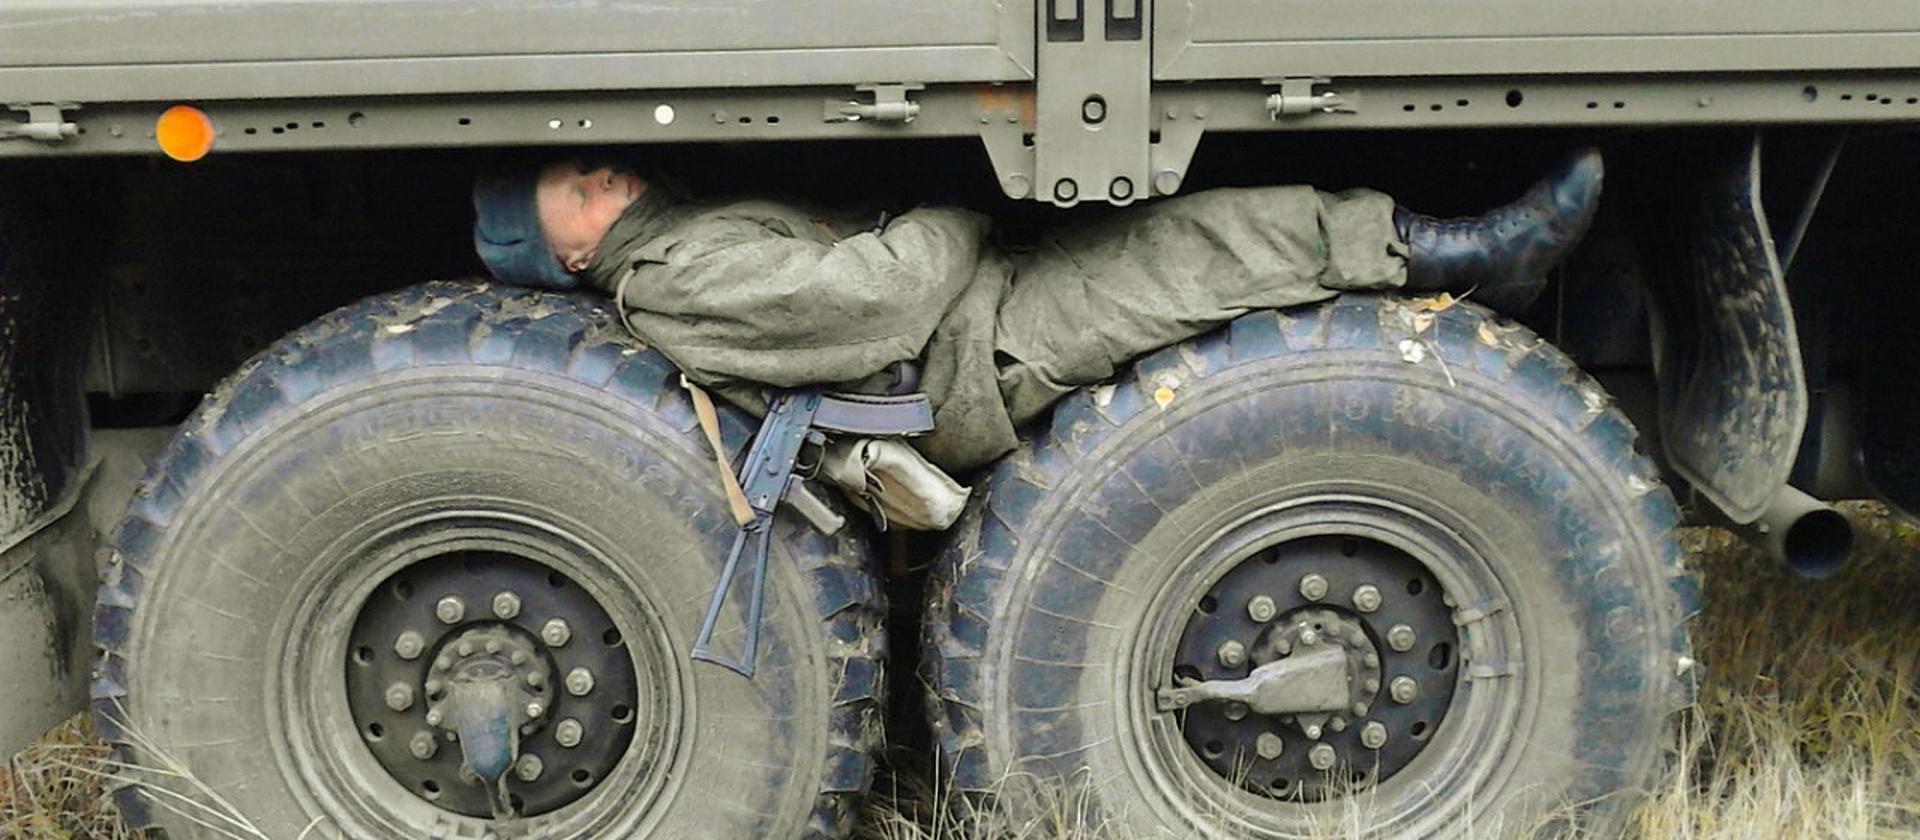 Солдат спит - служба идет?